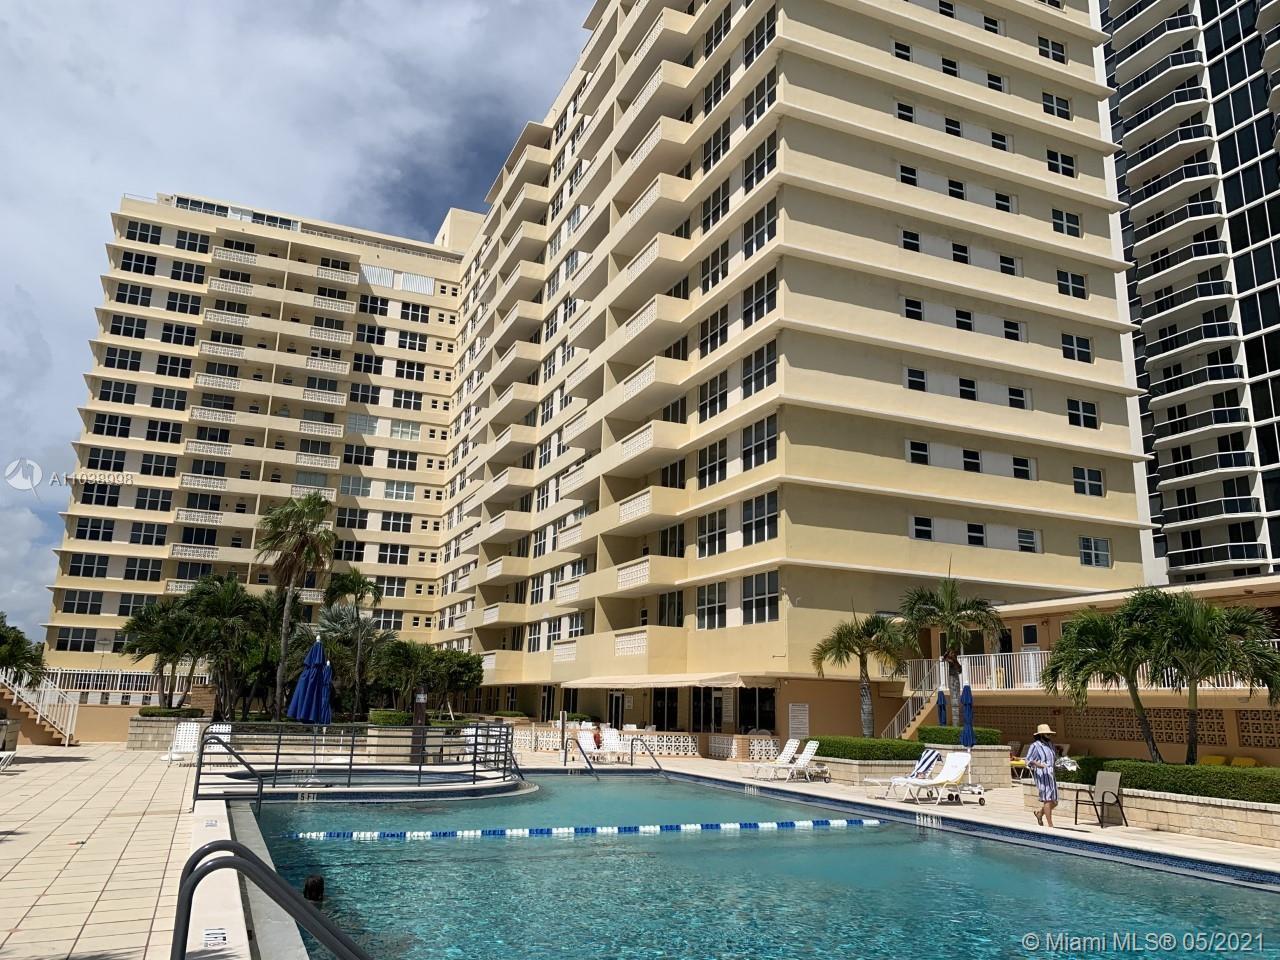 Location!1 Location!! Location!! Prime Miami Beach Location! Oceanfront building, spacious condo wit